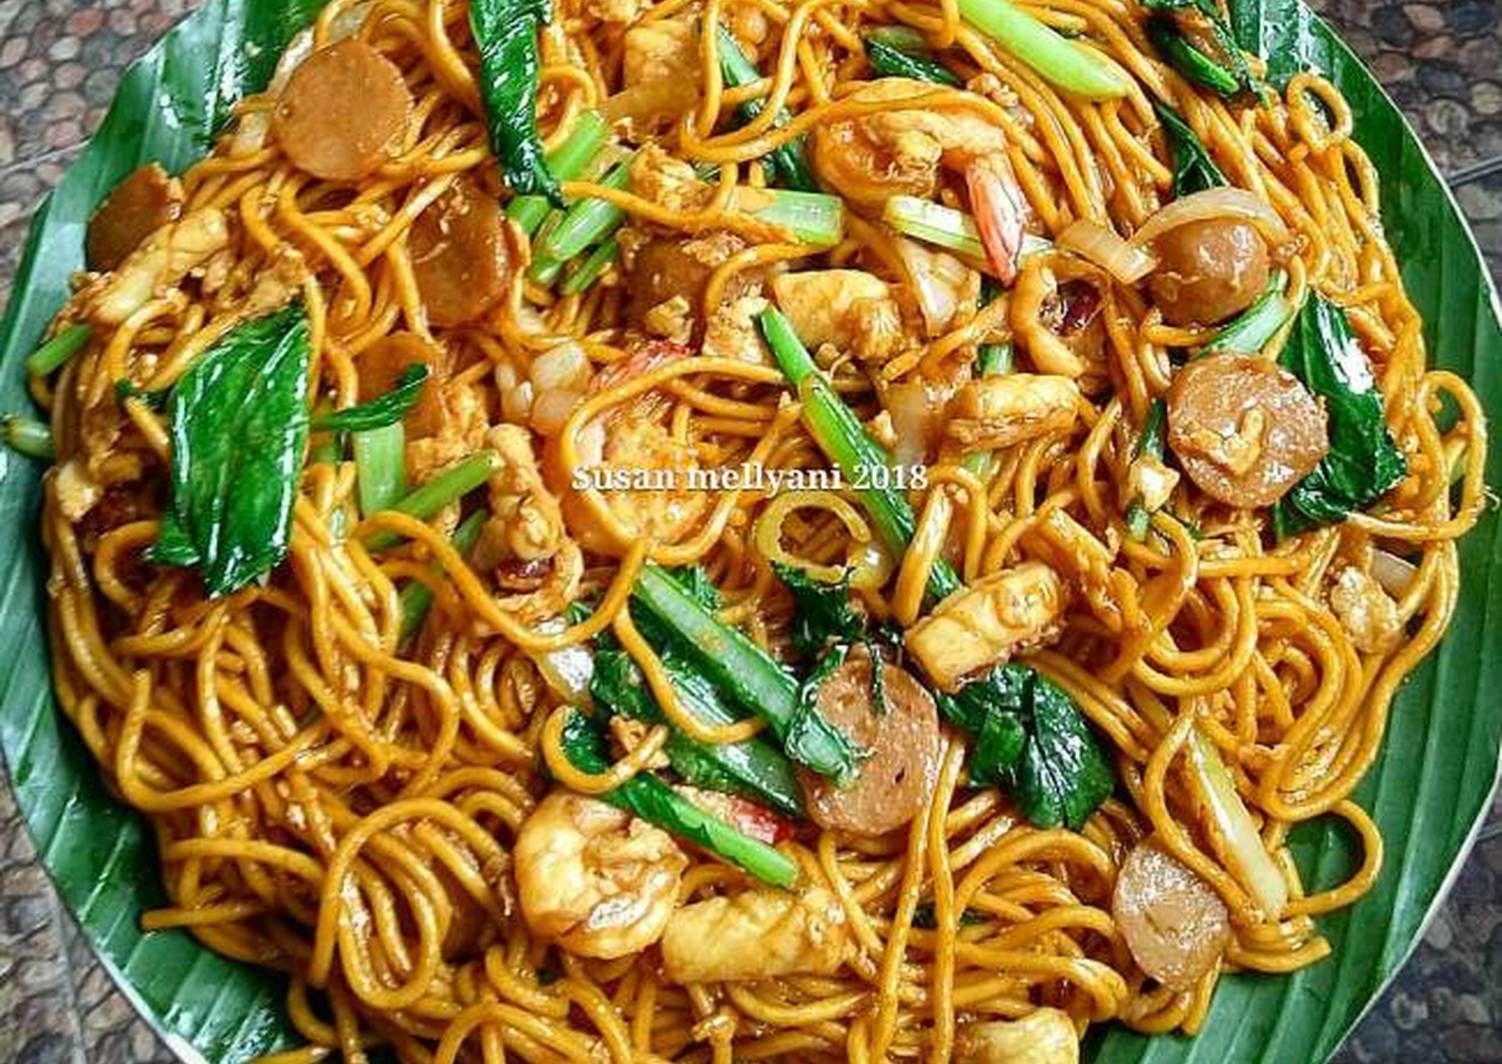 Resep Mie Goreng Seafood Oleh Susan Mellyani Resep Resep Masakan Masakan Makanan Laut